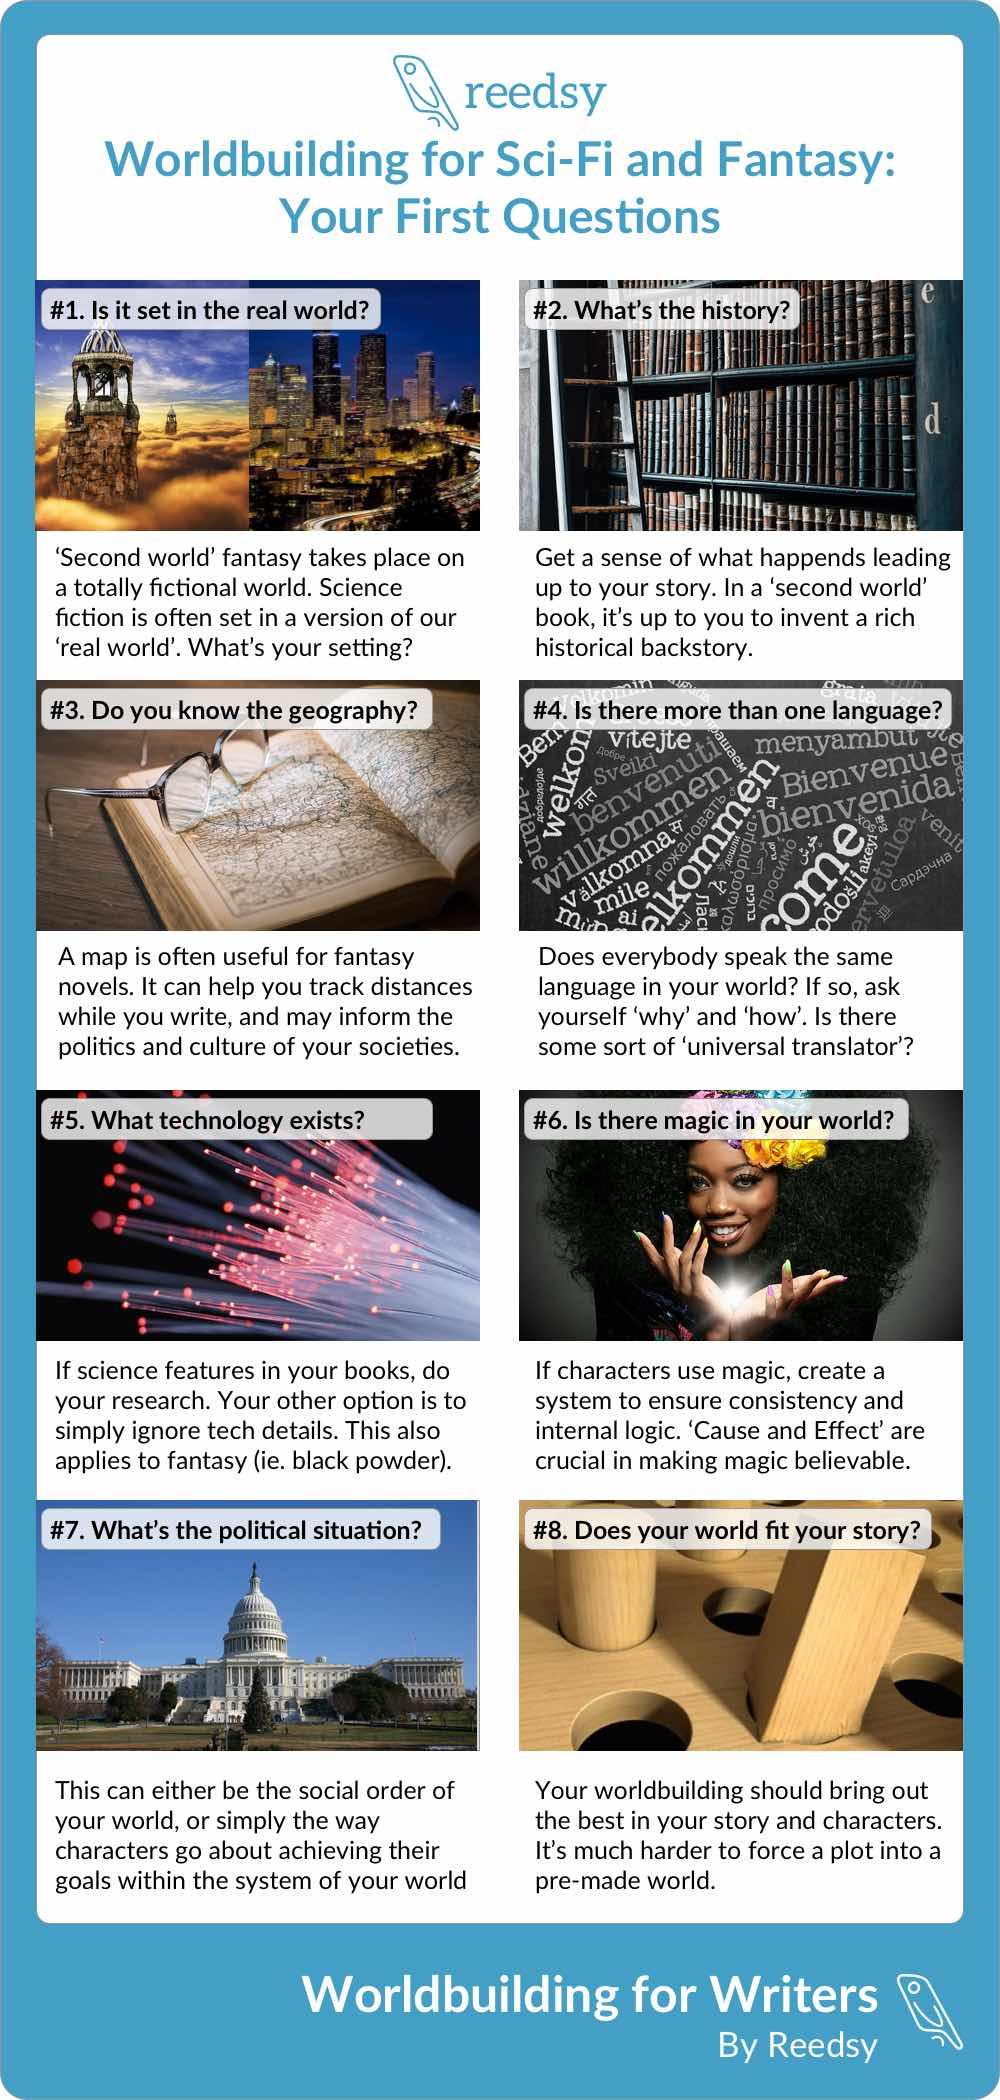 Reedsy Worldbuilding Infographic